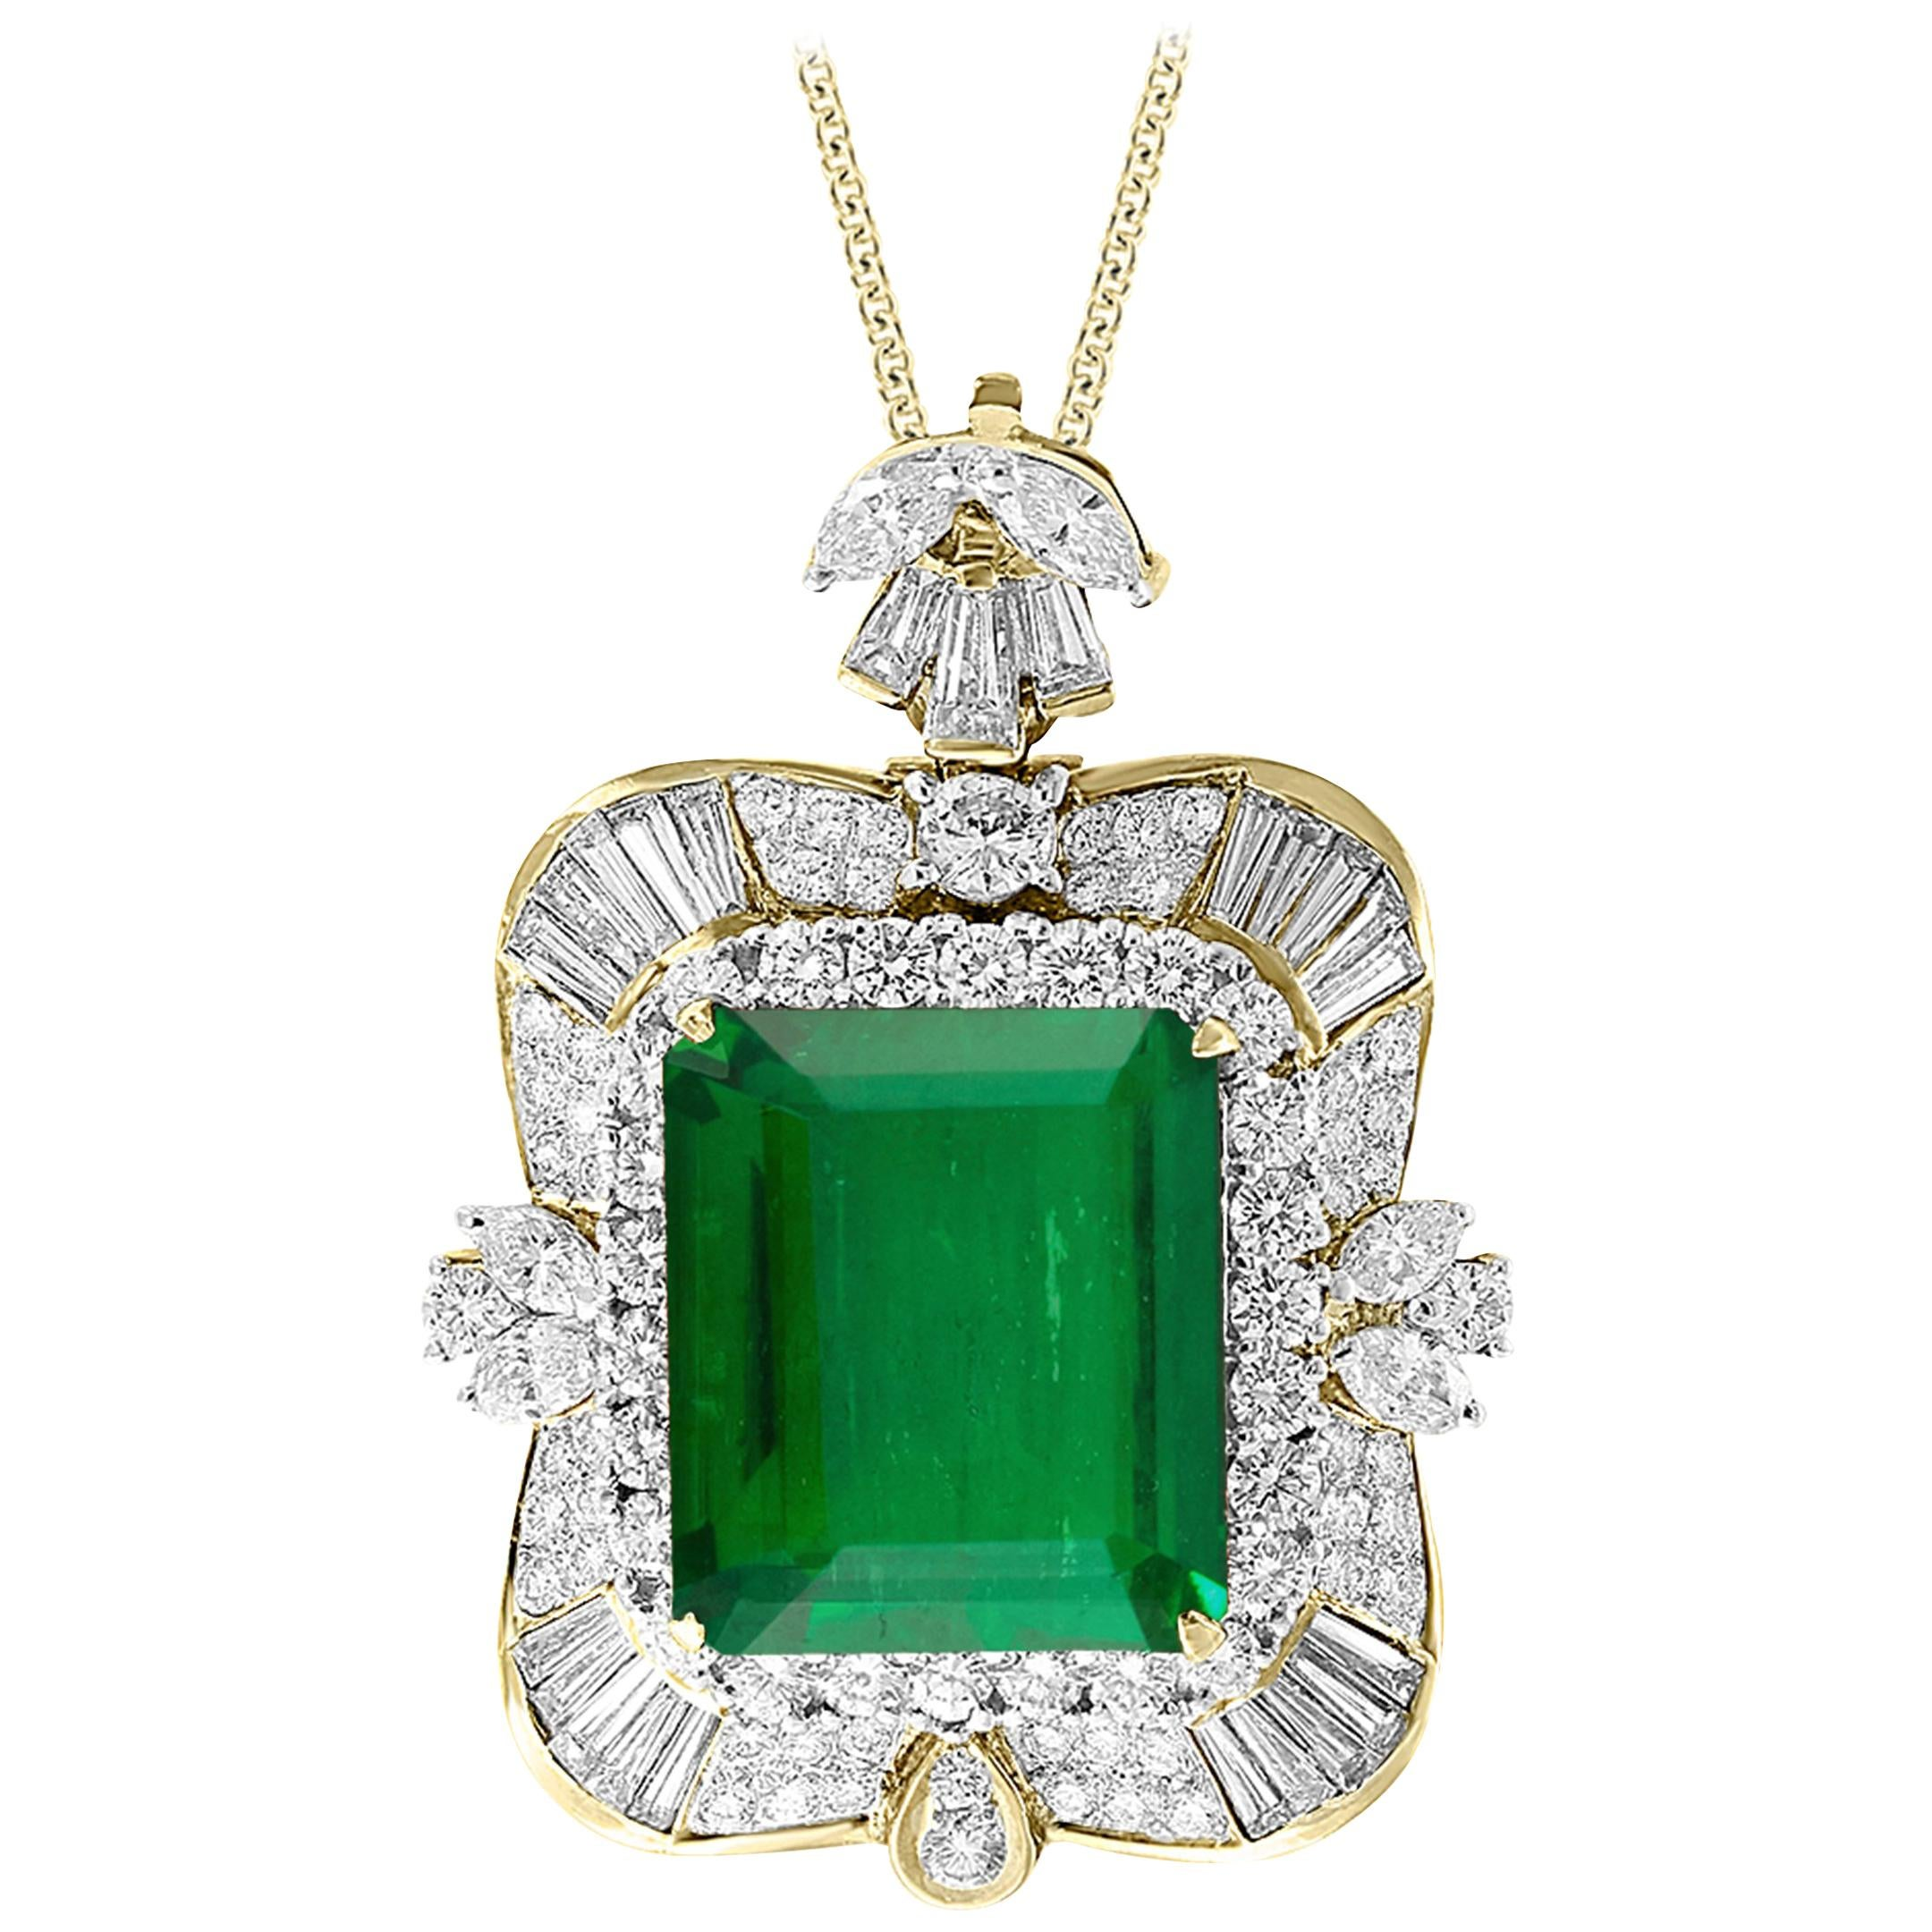 AGL Certified Minor 23.84 Ct Colombian Emerald & Diamond Pendent/Necklace Estate